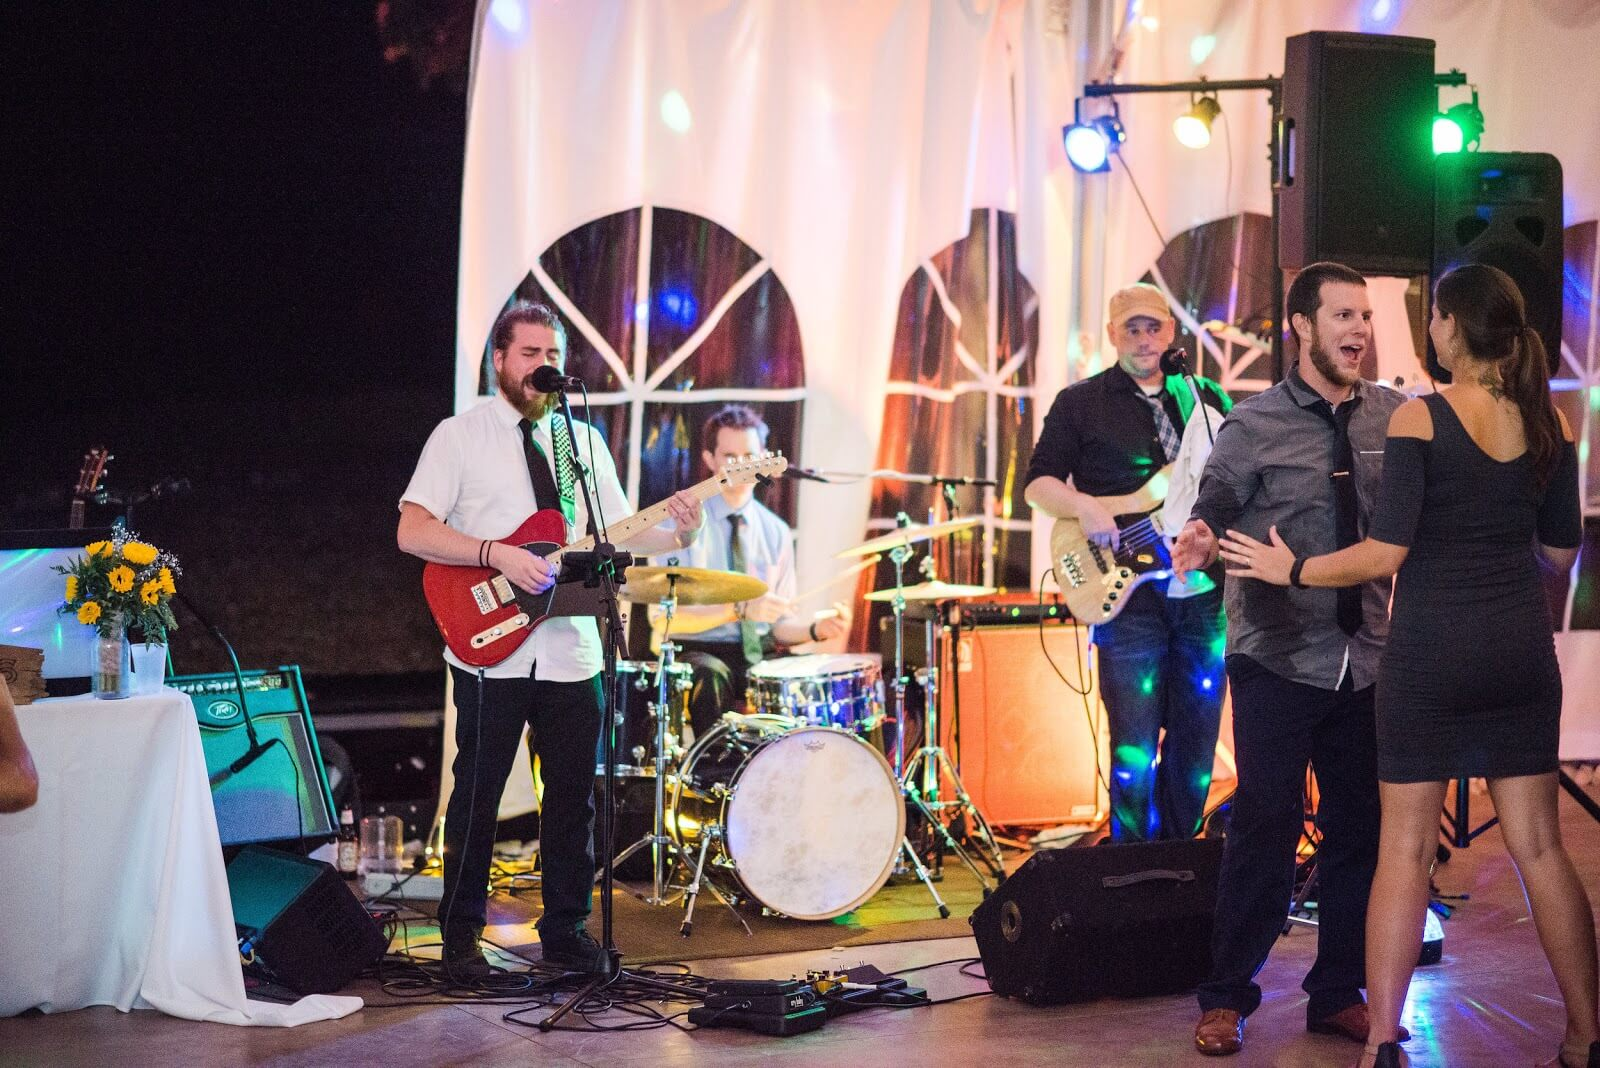 Dan McGuire Band